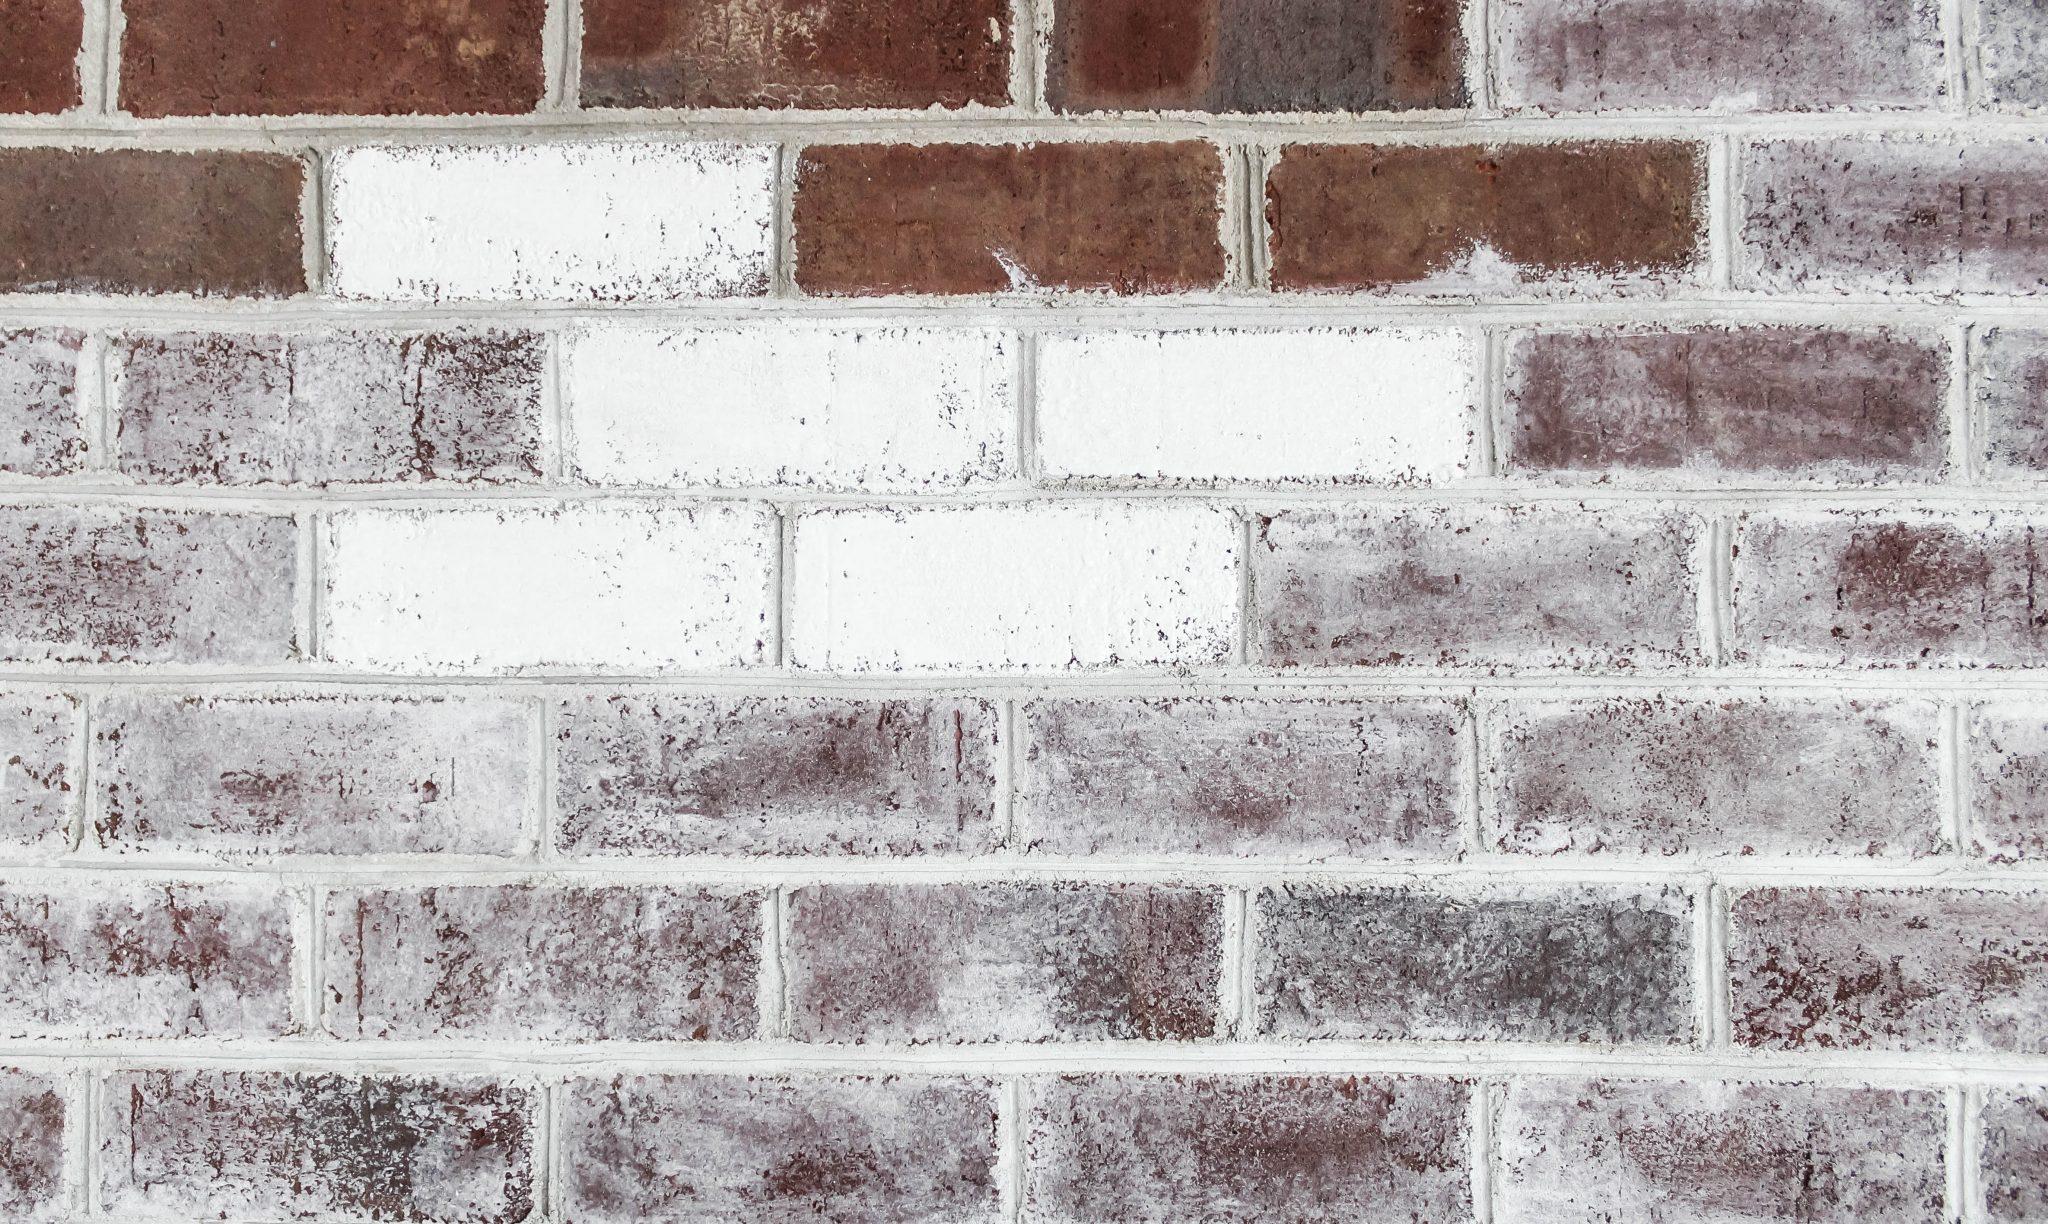 Progress: Rough painted bricks vs. whitewashed bricks